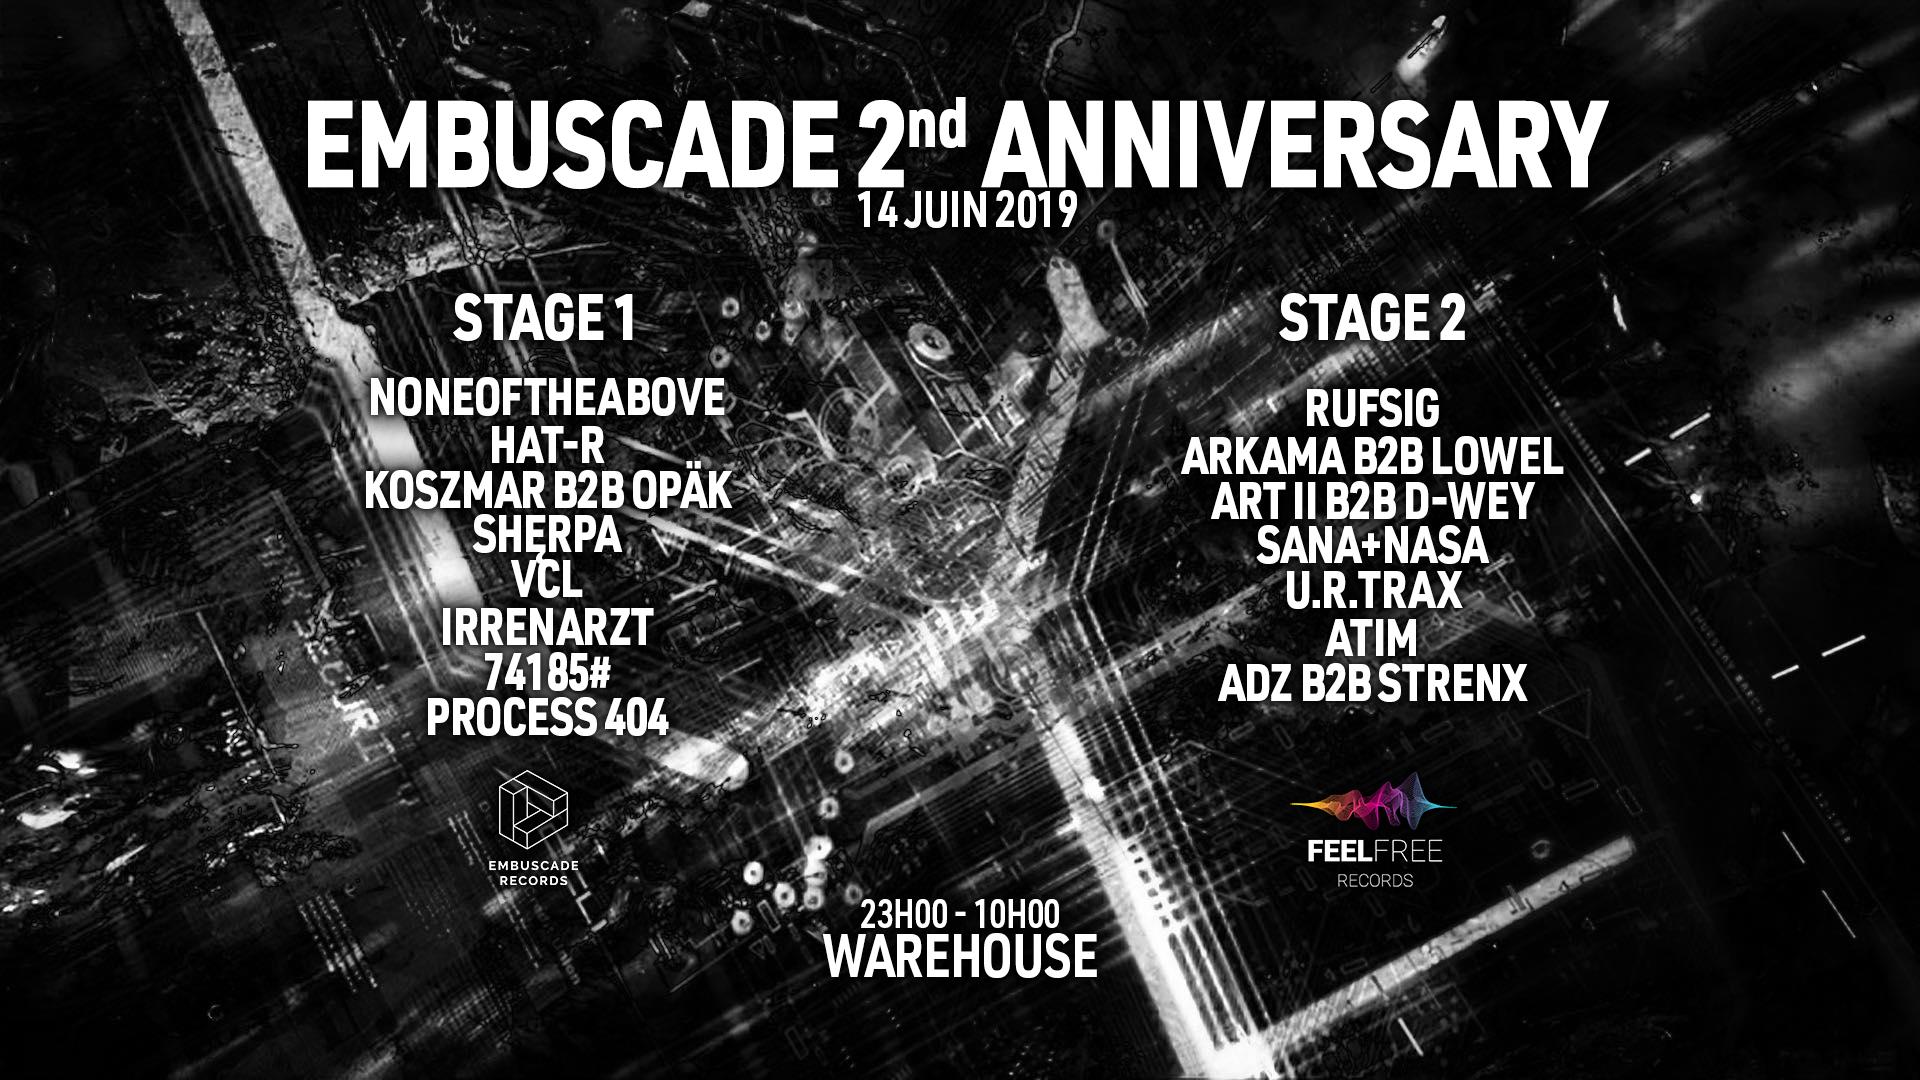 EMBUSCADE 2nd ANNIVERSARY